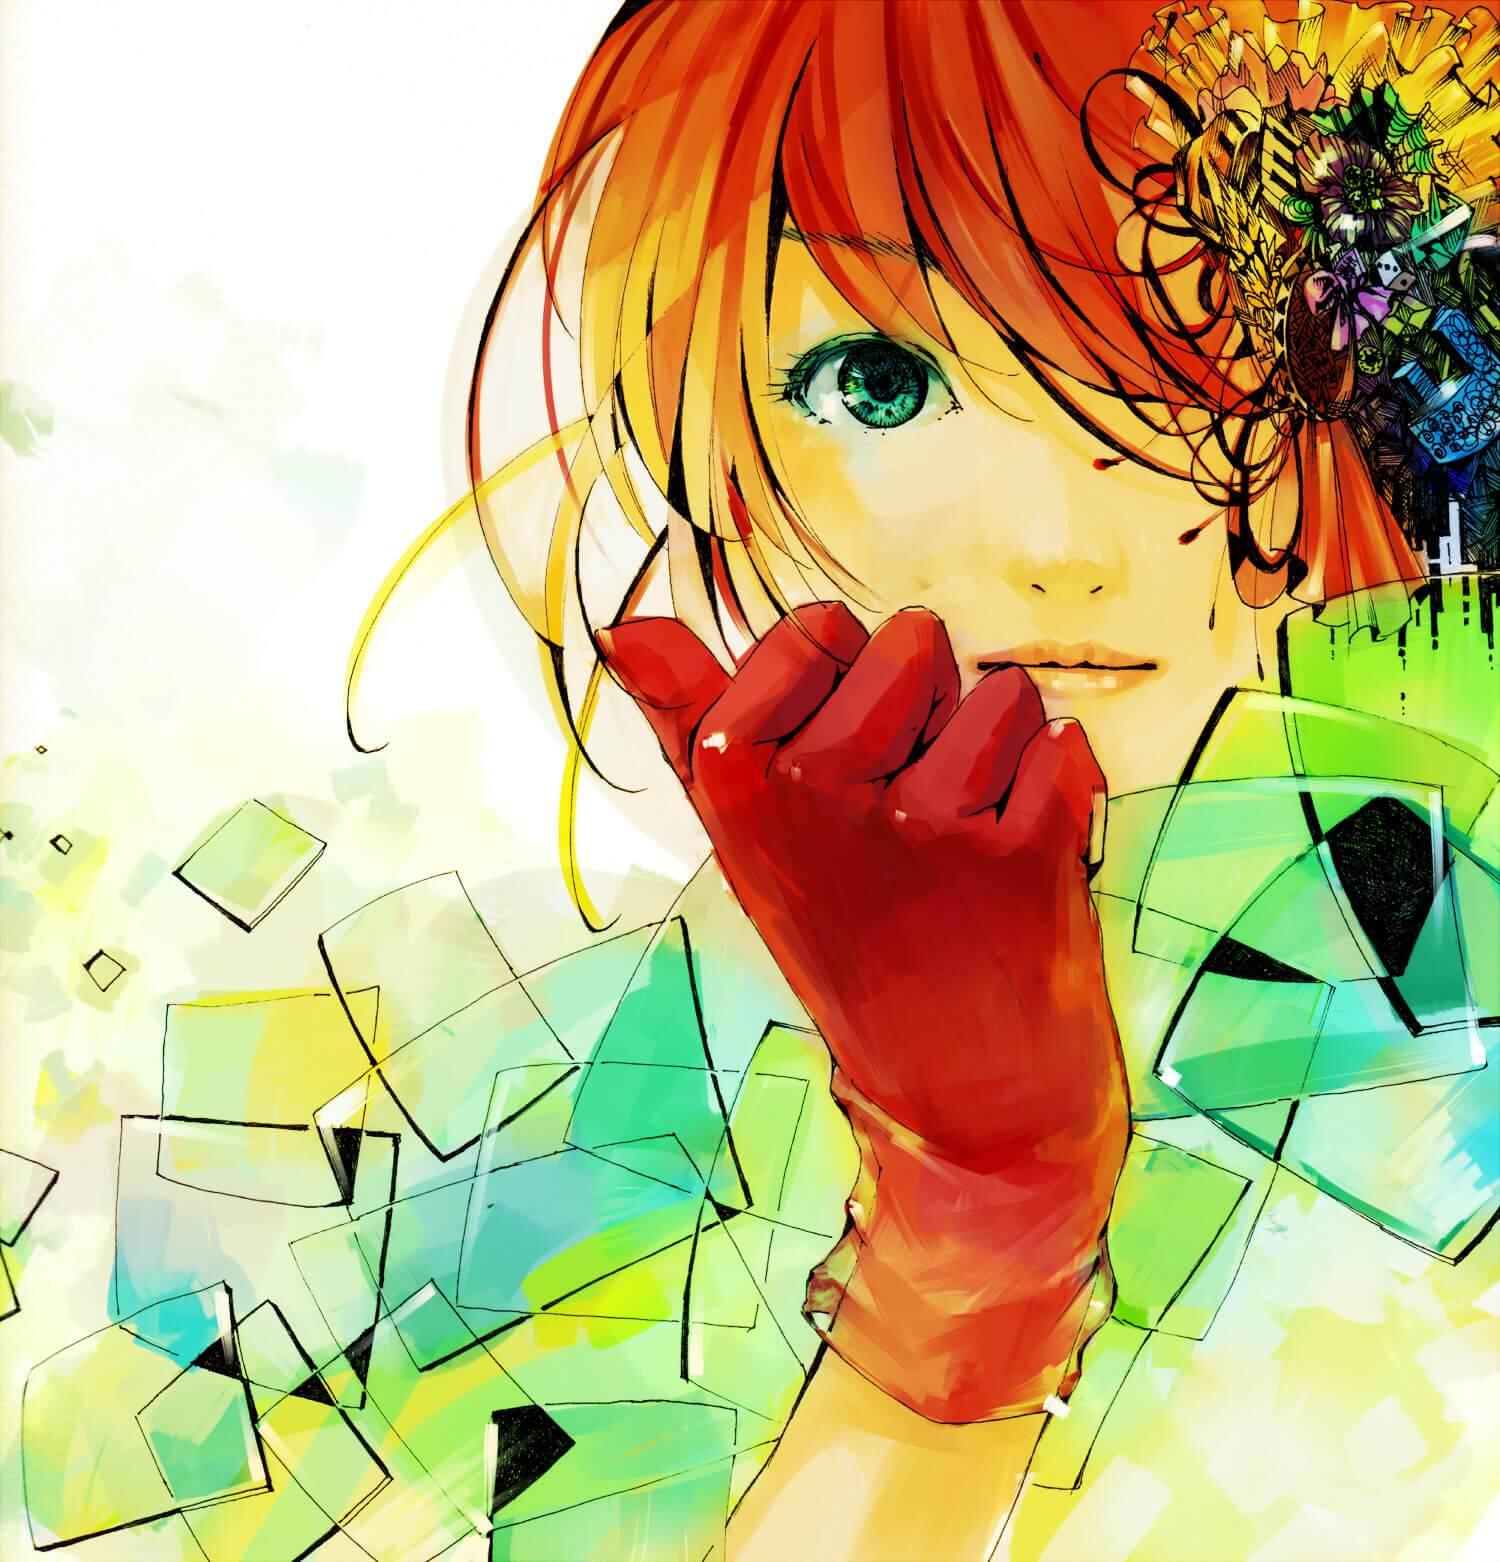 Рыжая кудрявая девочка